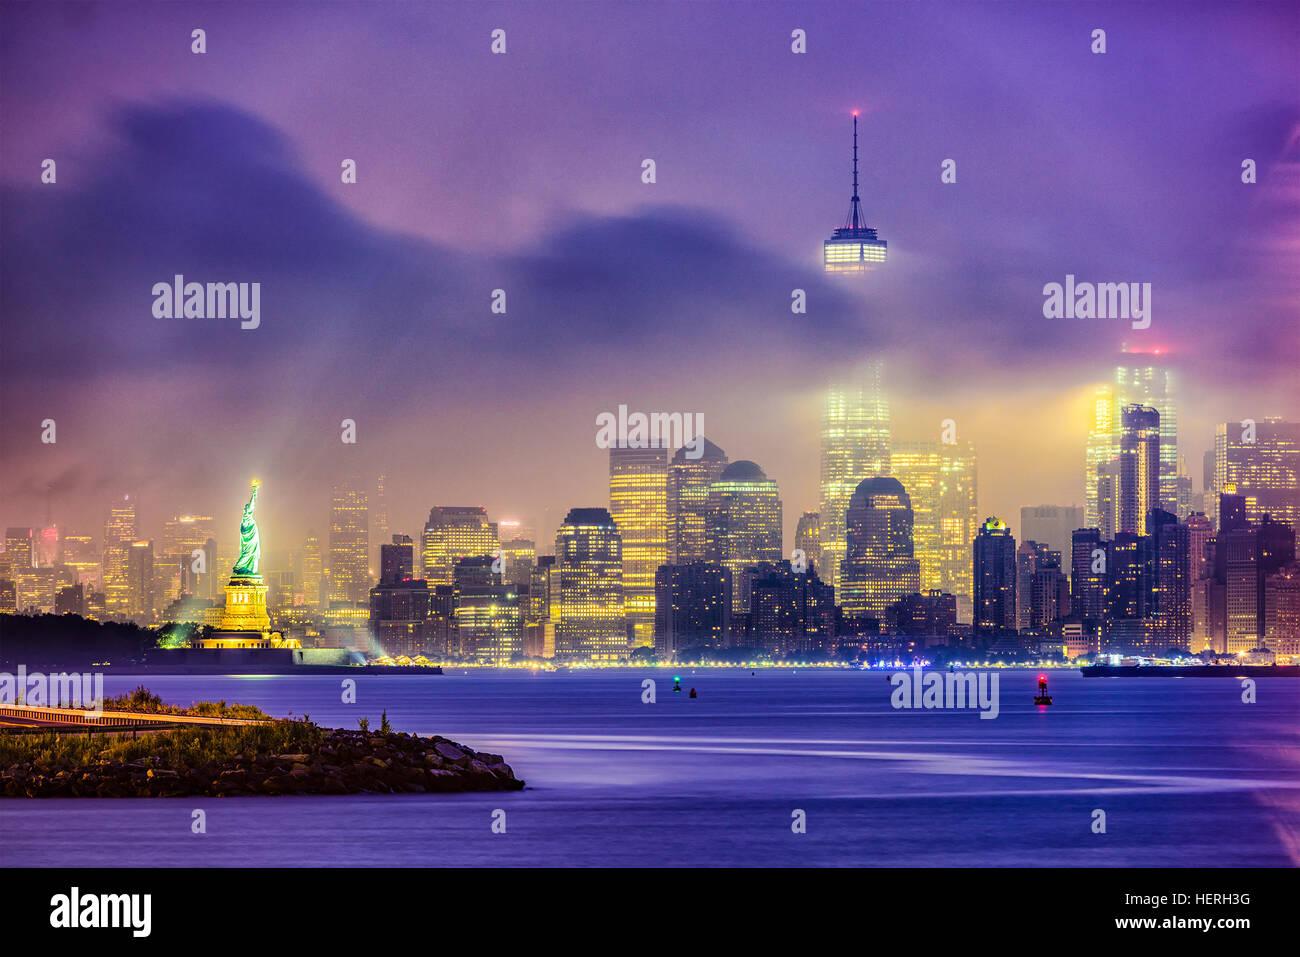 New York City skyline on a foggy night. - Stock Image